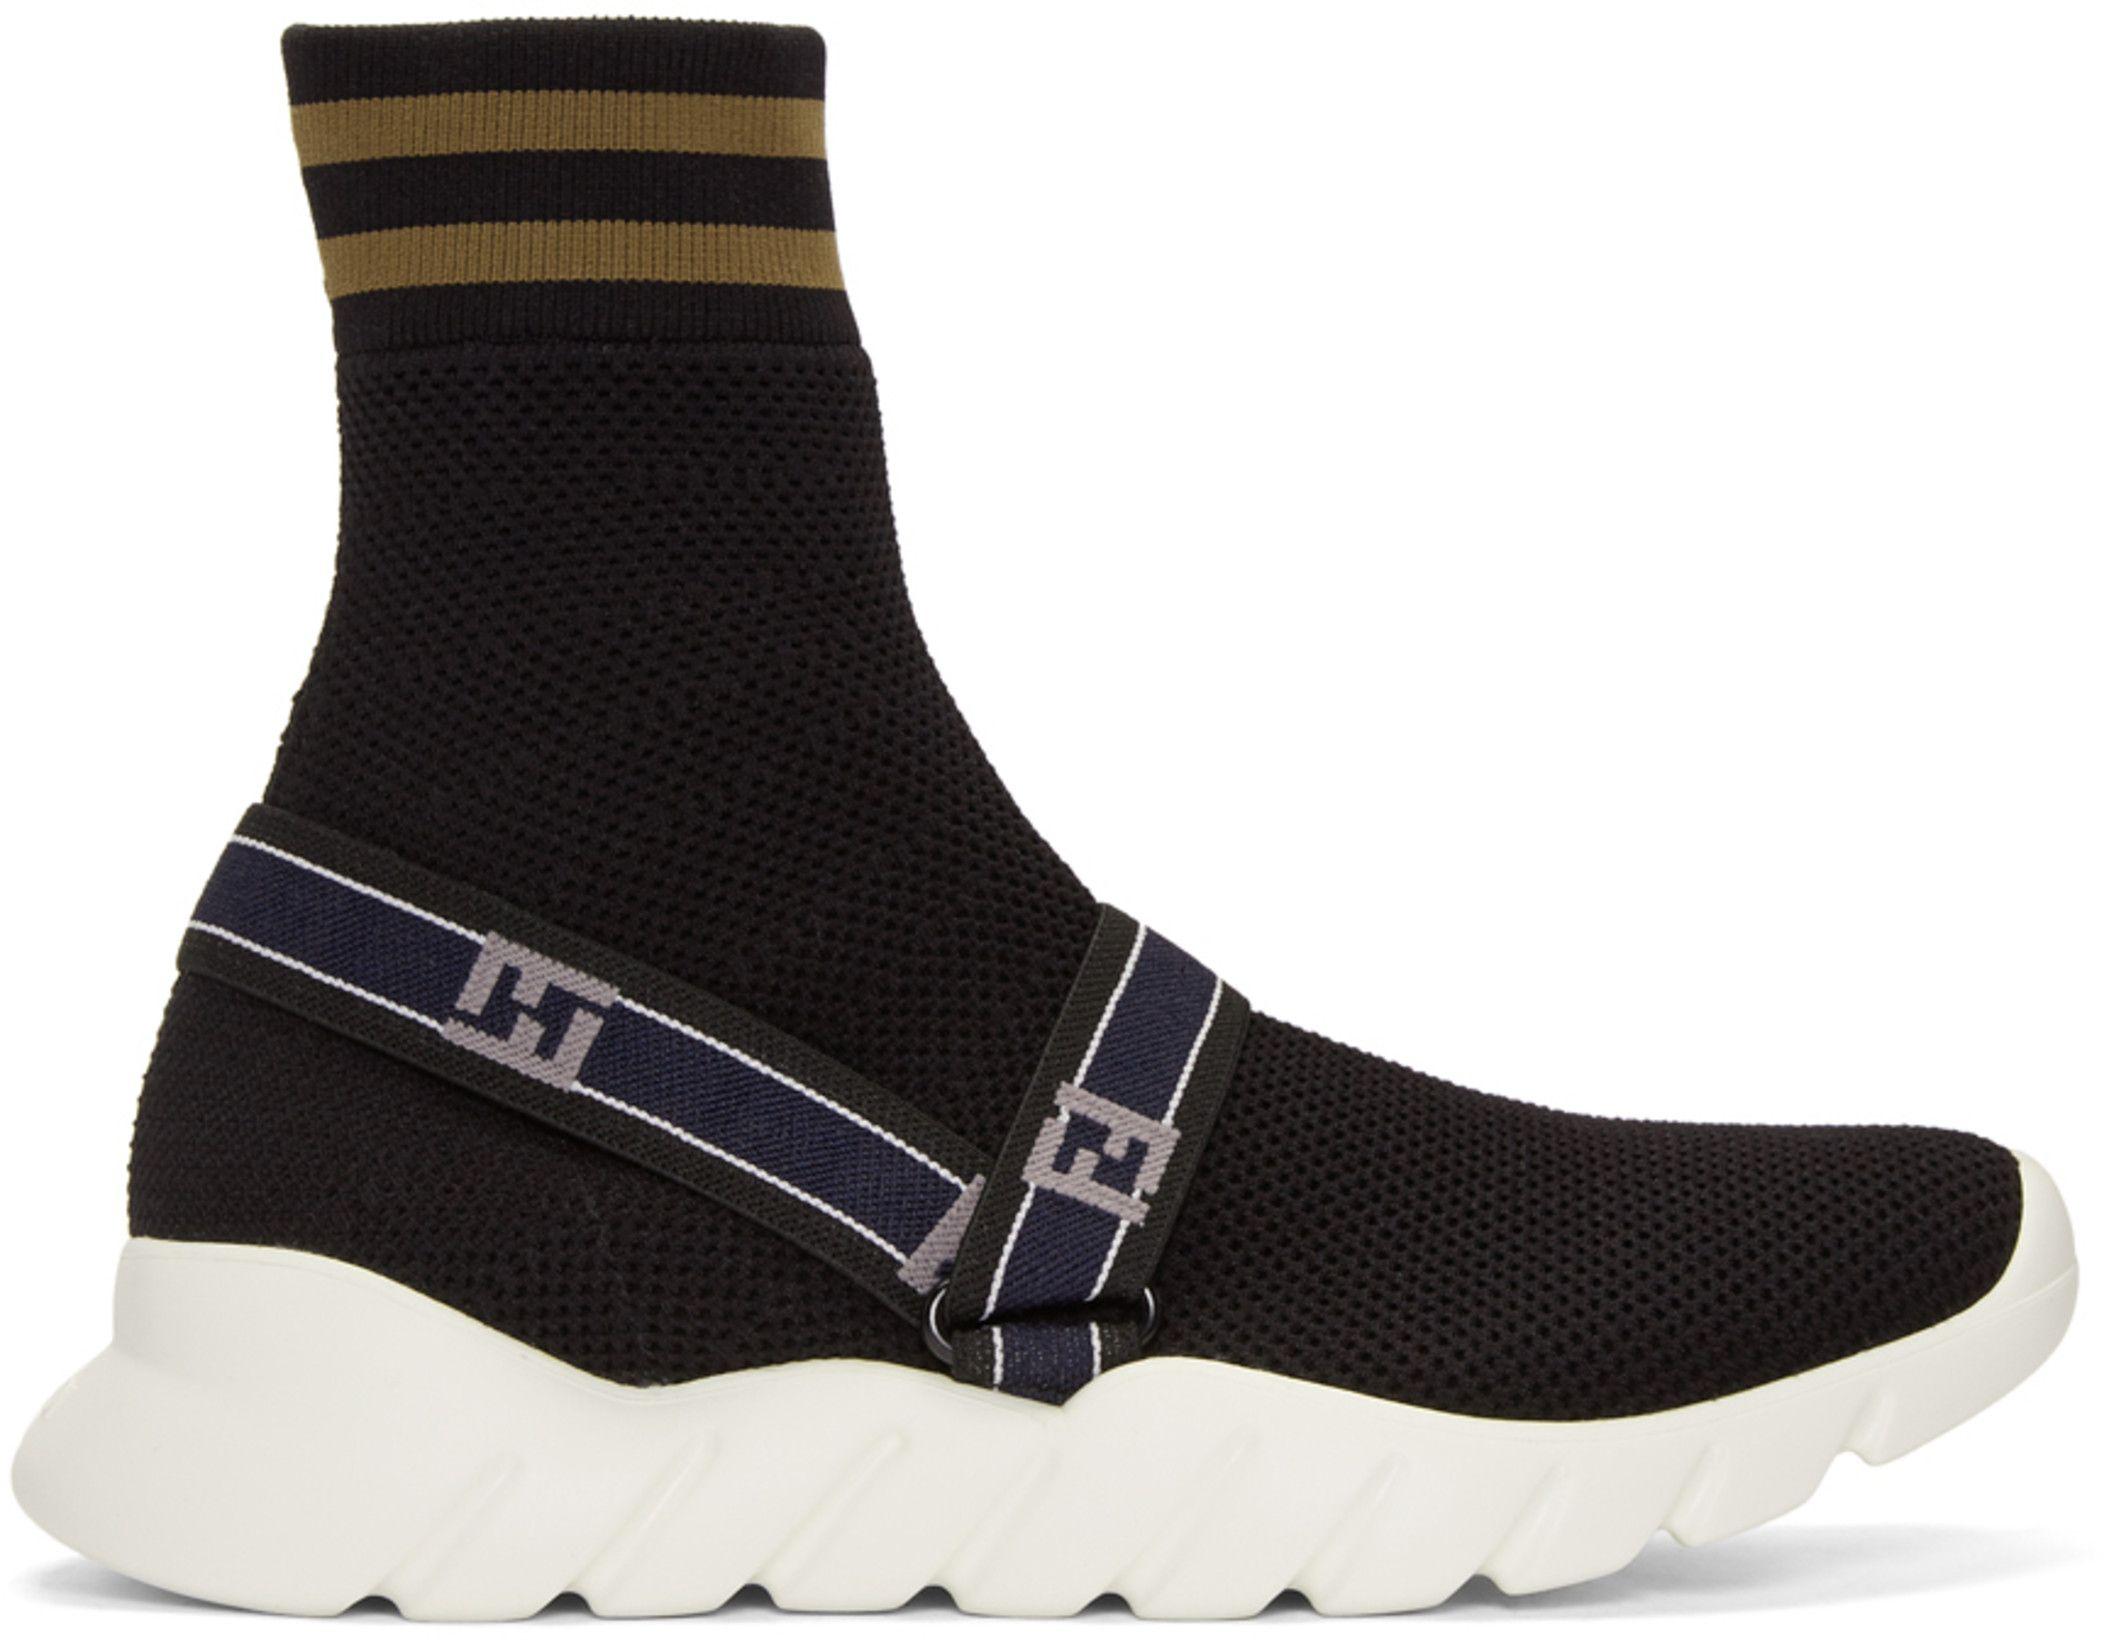 6638714e486b Fendi - Black  Forever Fendi  Knit High-Top Sneakers   for items ...